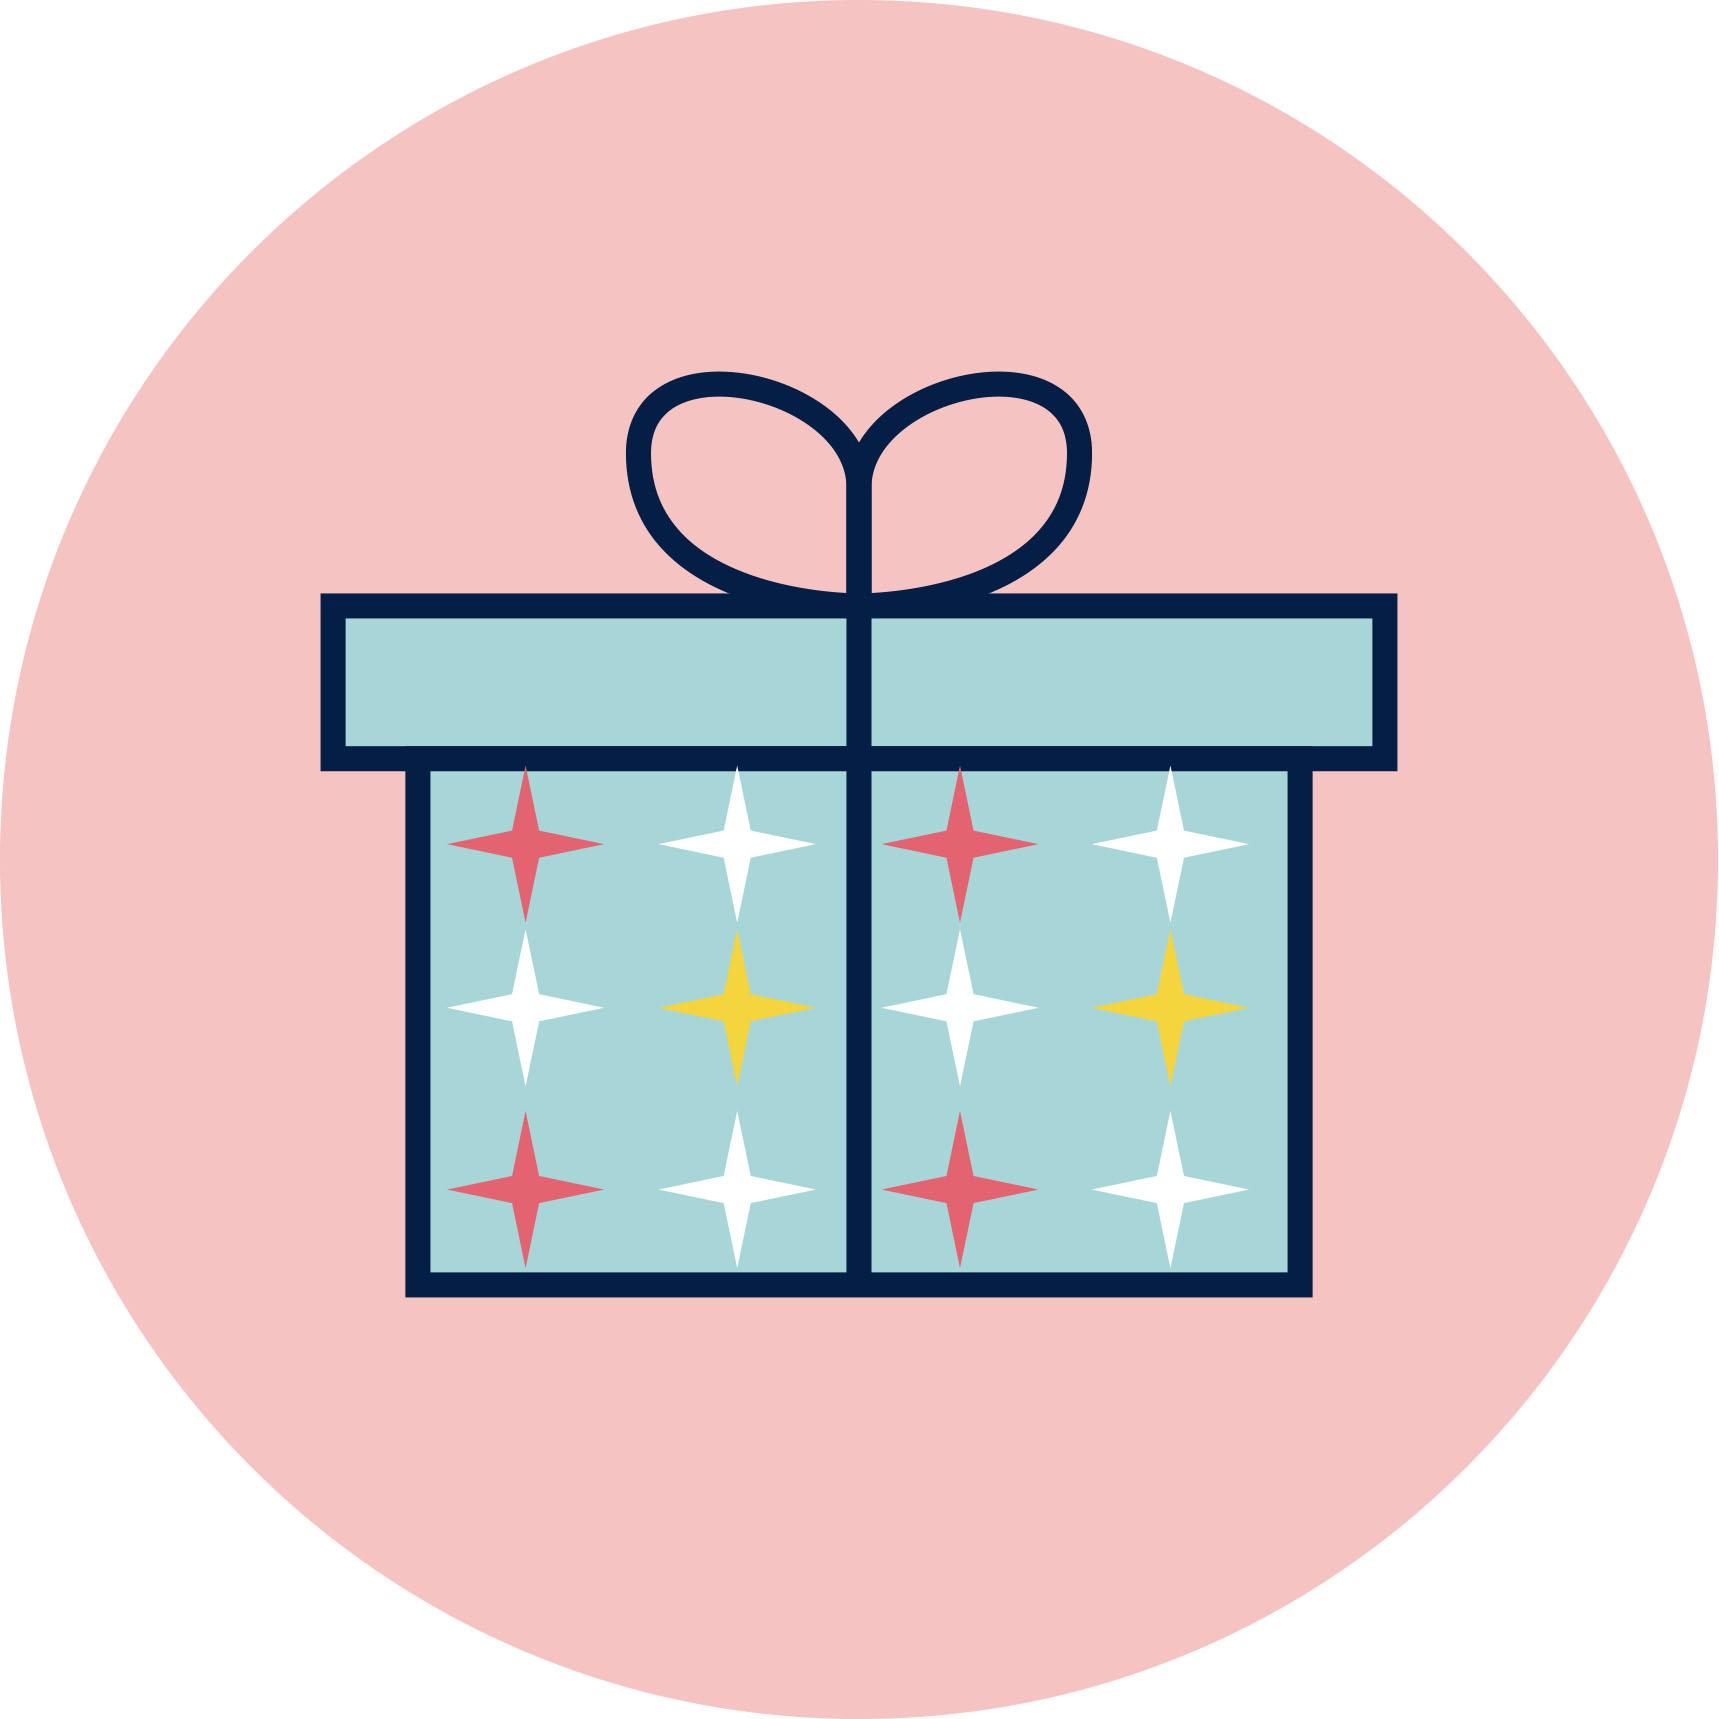 flourish-retail-icon-toolkit-coral-light.jpg